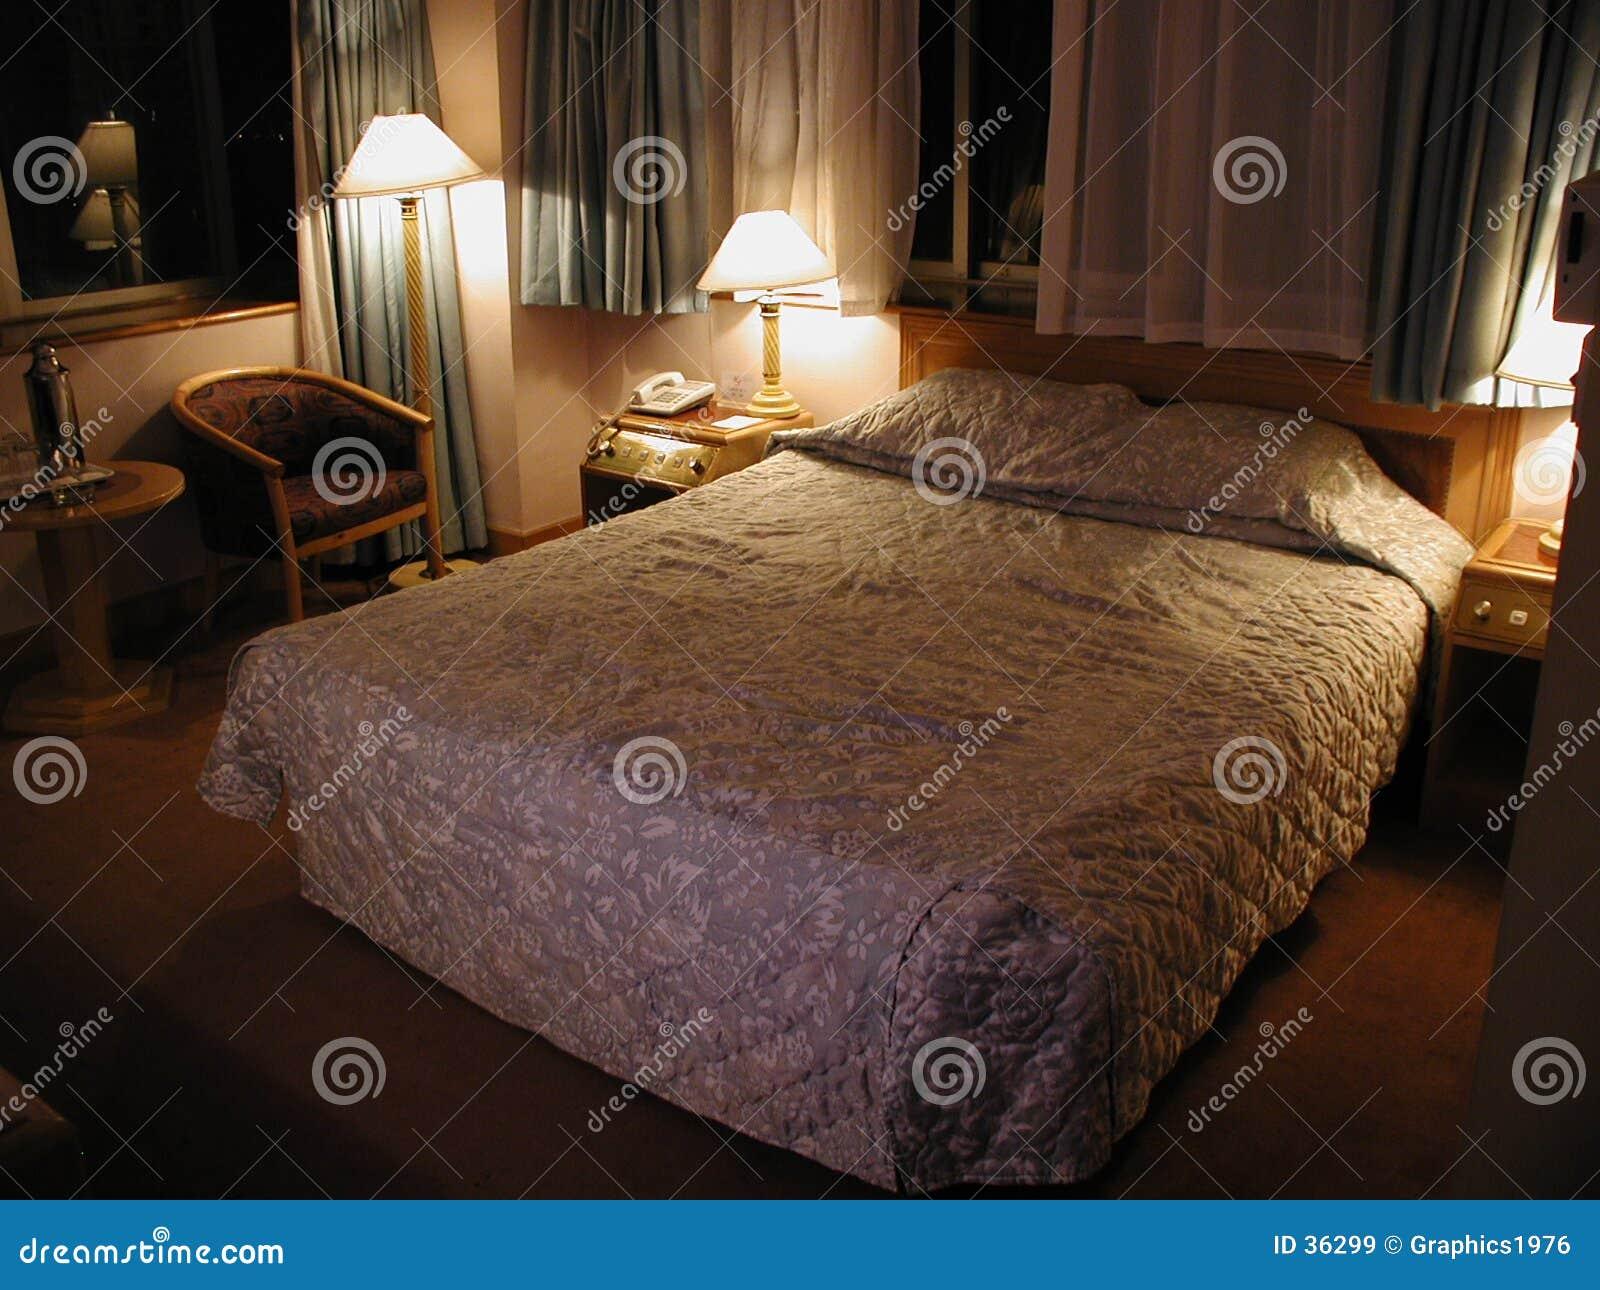 Typical mid-range hotel room